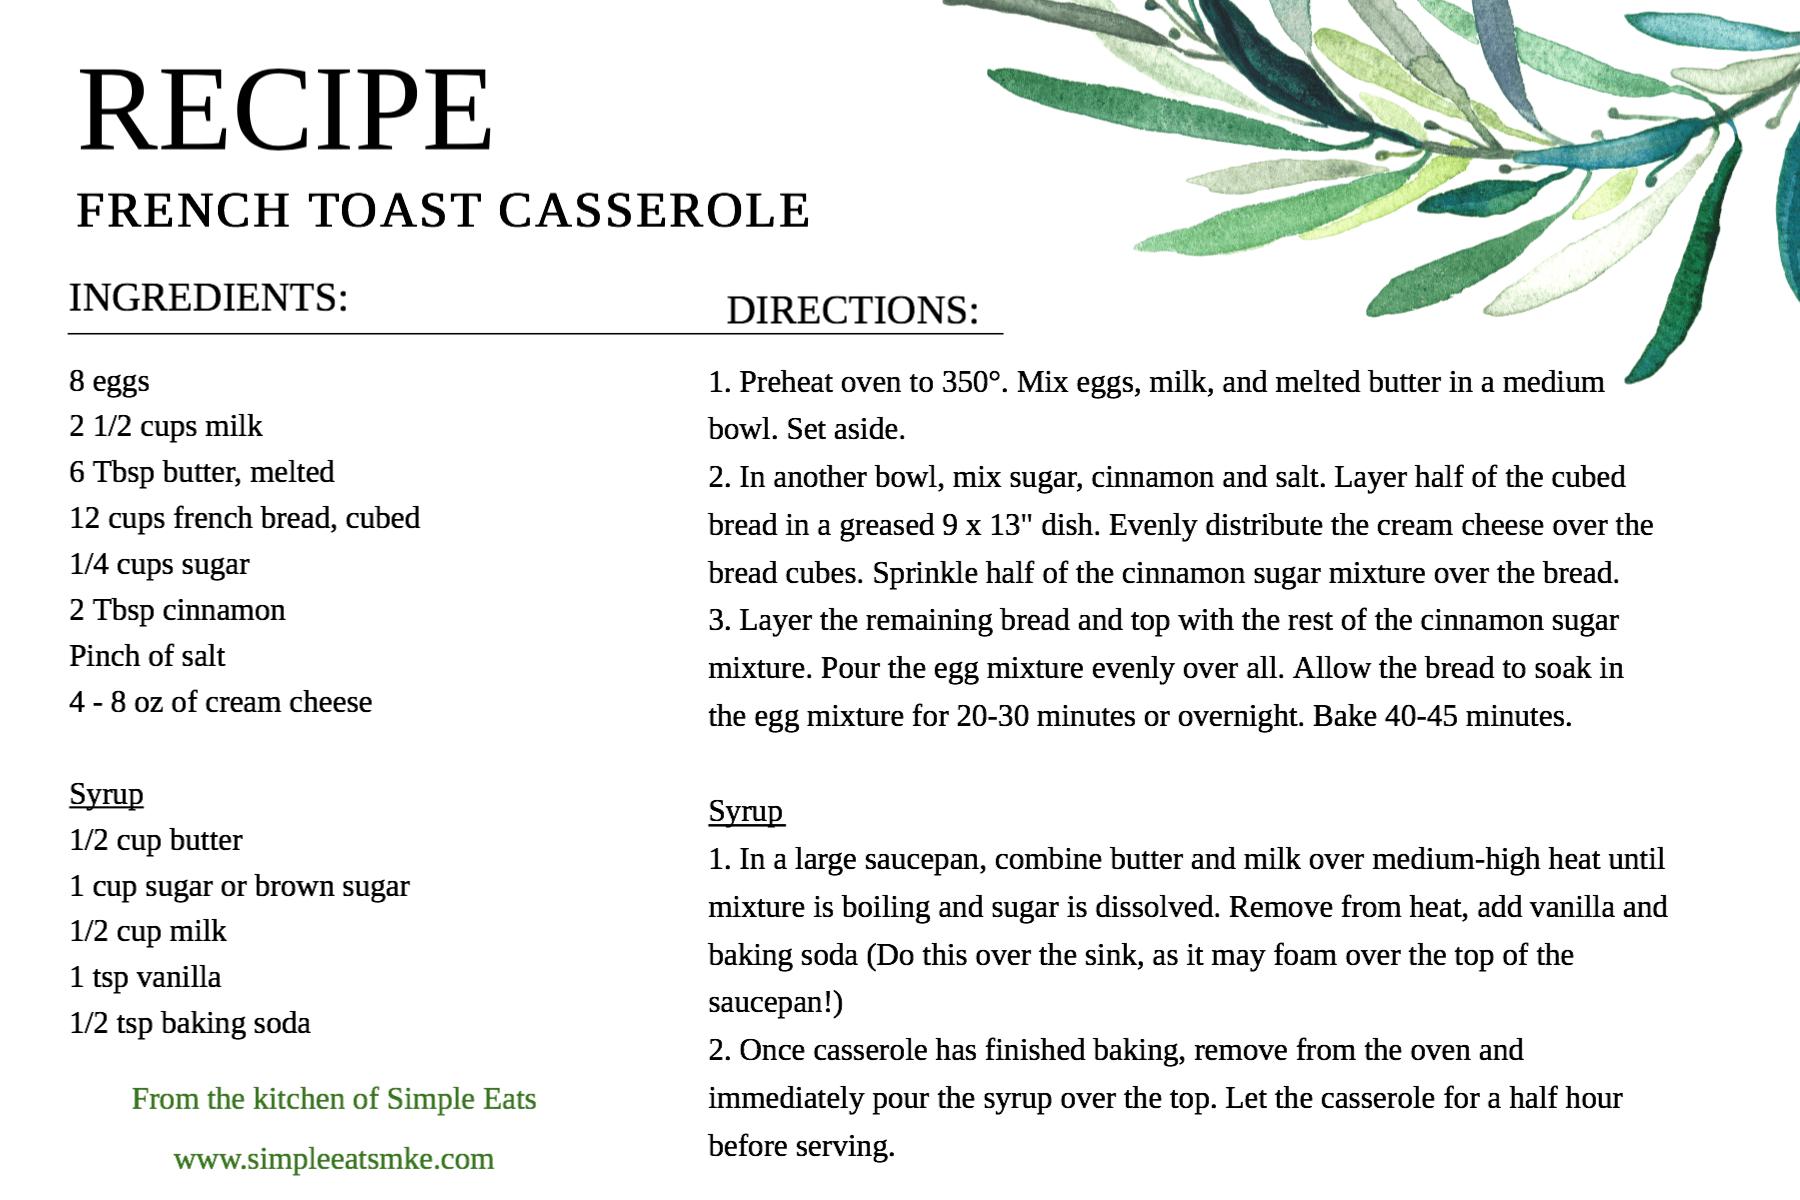 French Toast Casserole.jpg